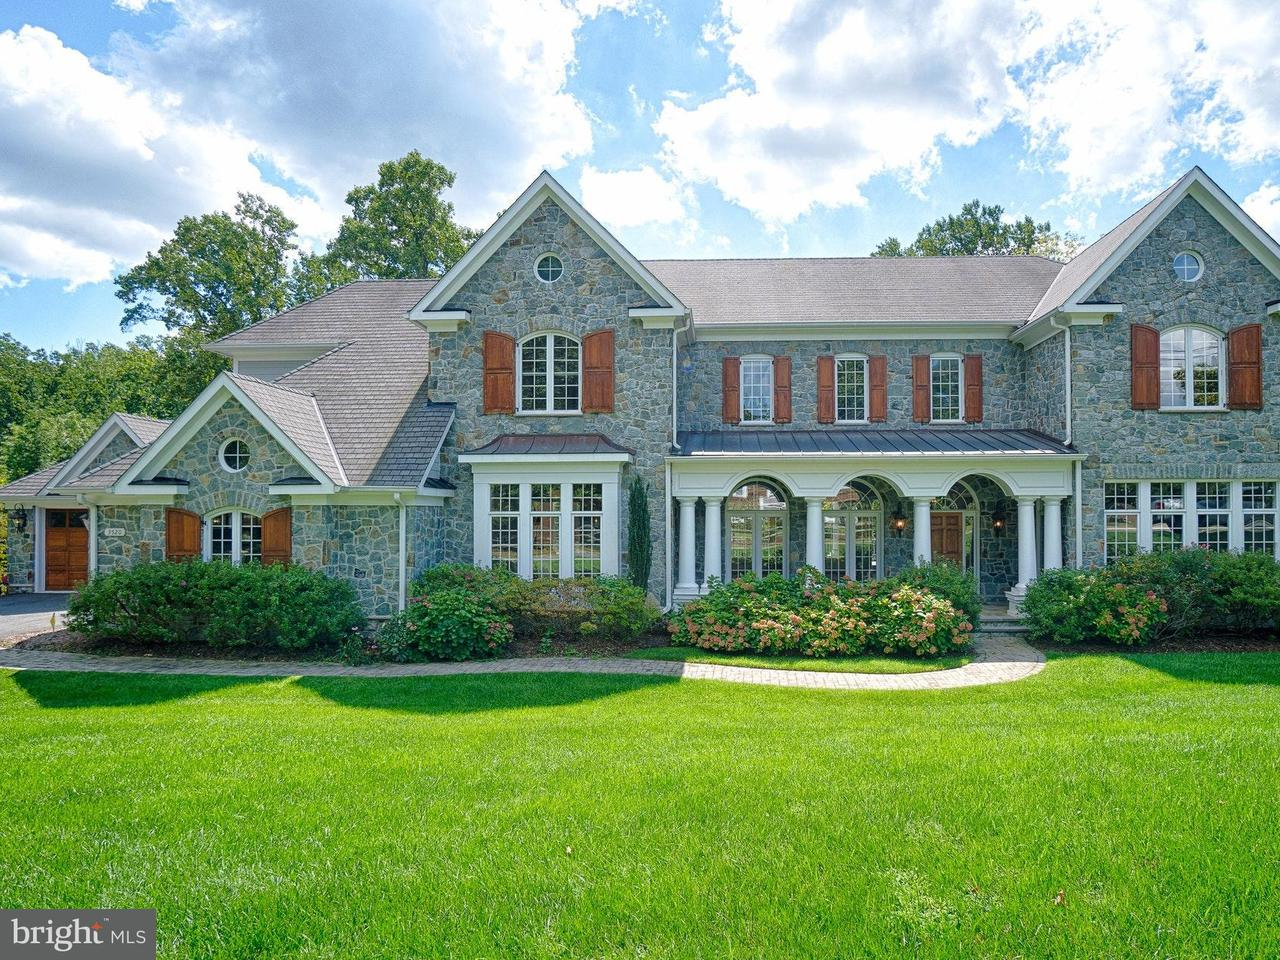 Single Family Home for Sale at 3520 Roberts Lane 3520 Roberts Lane Arlington, Virginia 22207 United States